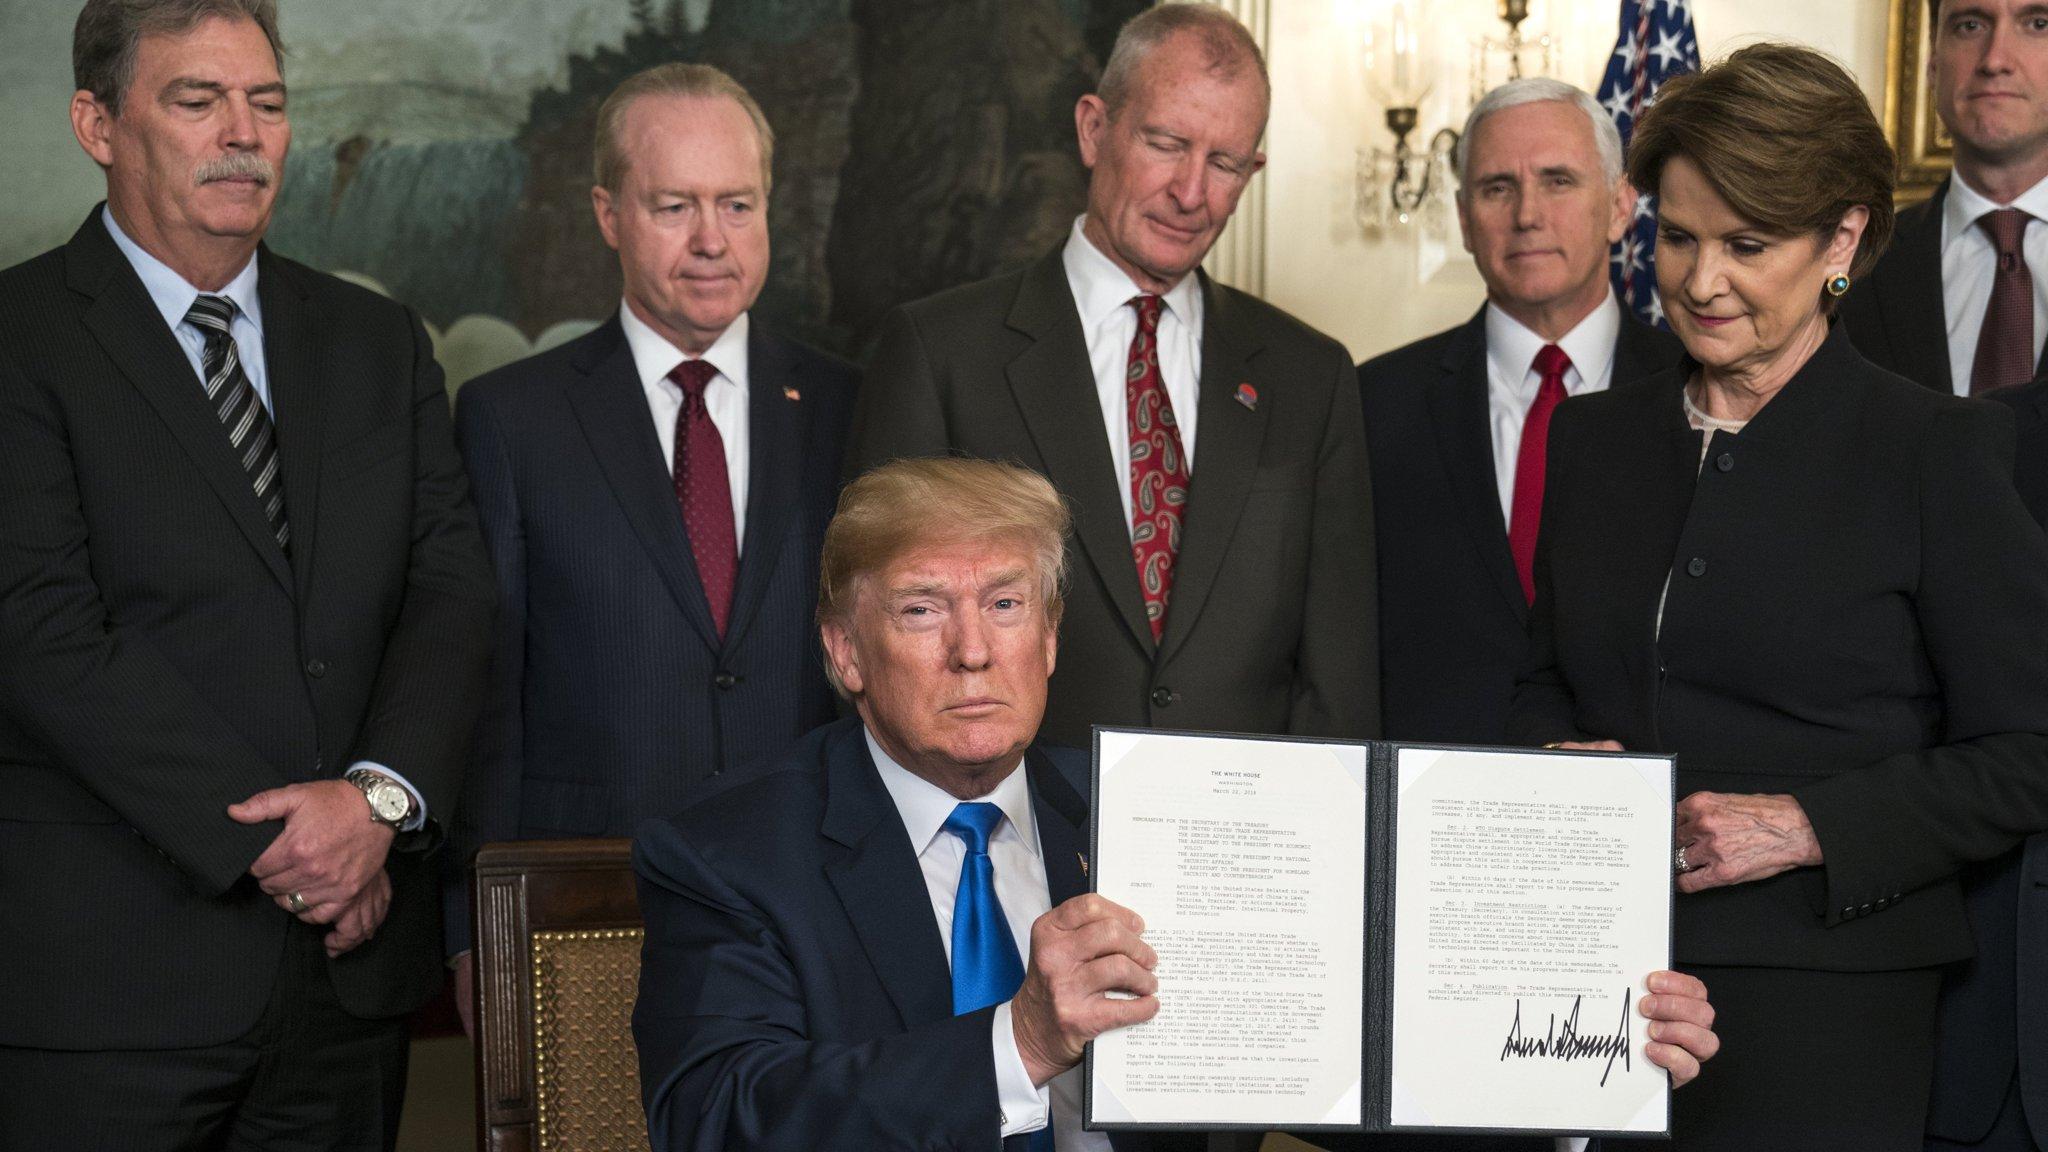 Daily briefing: Steel tariffs, Zuck response, Russian spies